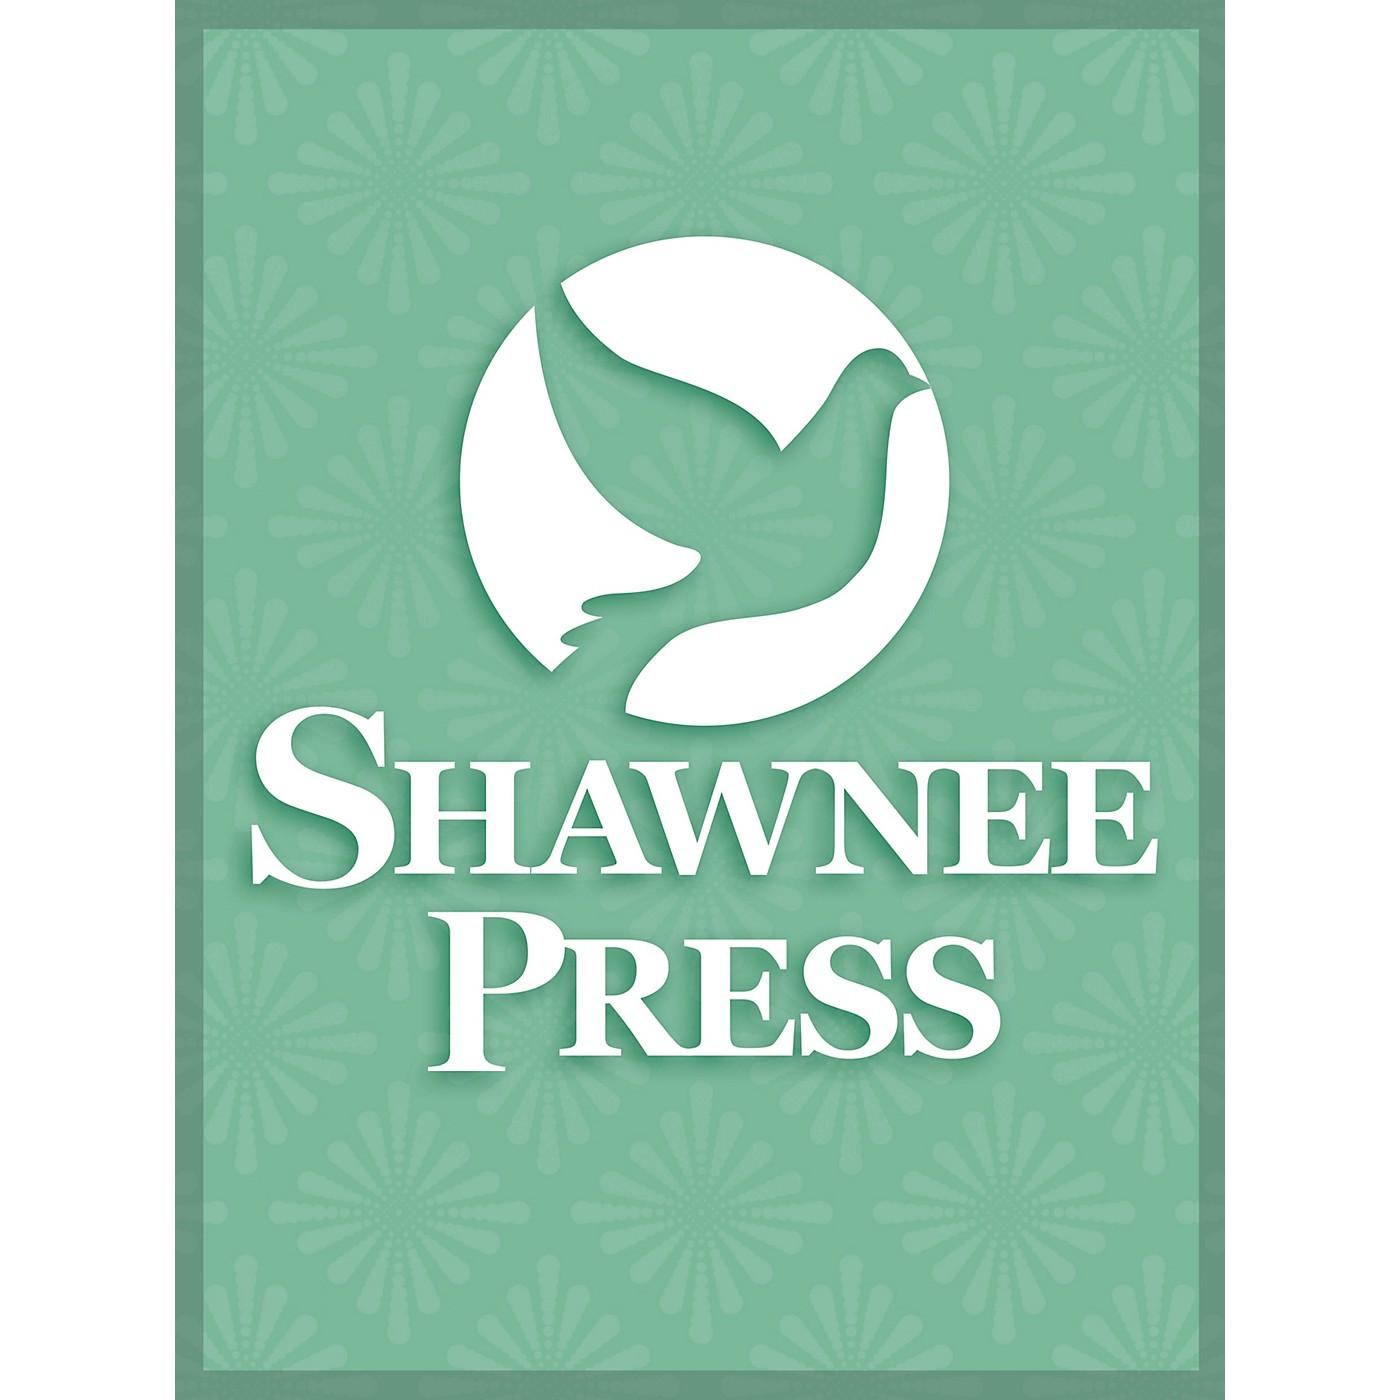 Margun Music Serenade for Wind Instruments Op. 40 Shawnee Press Series thumbnail